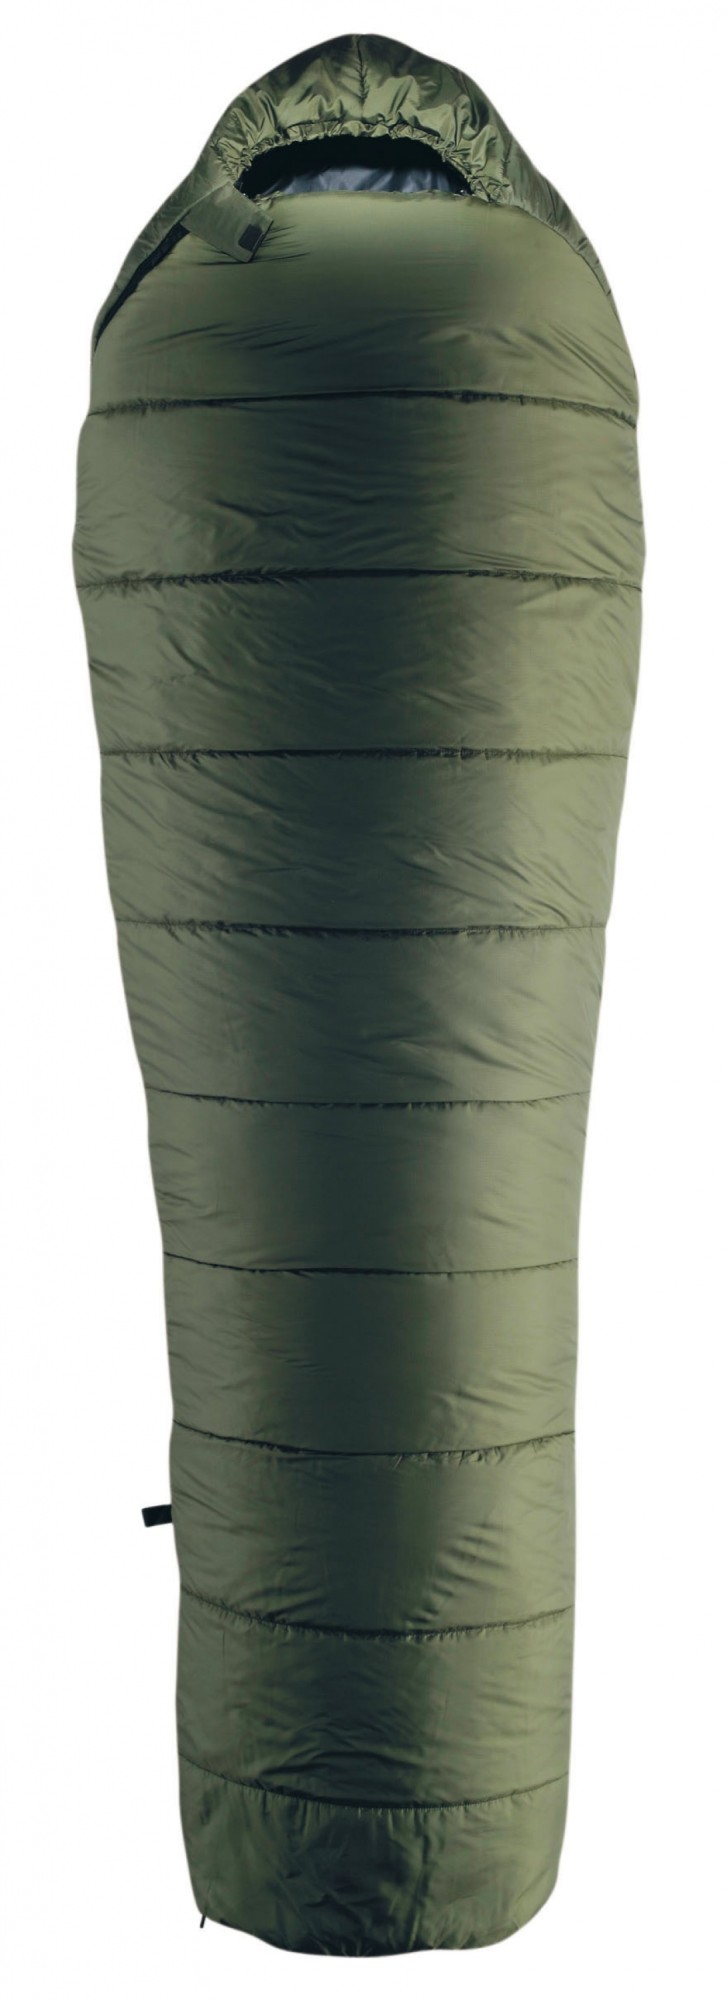 Bolsa sintética Nightec 600 -5